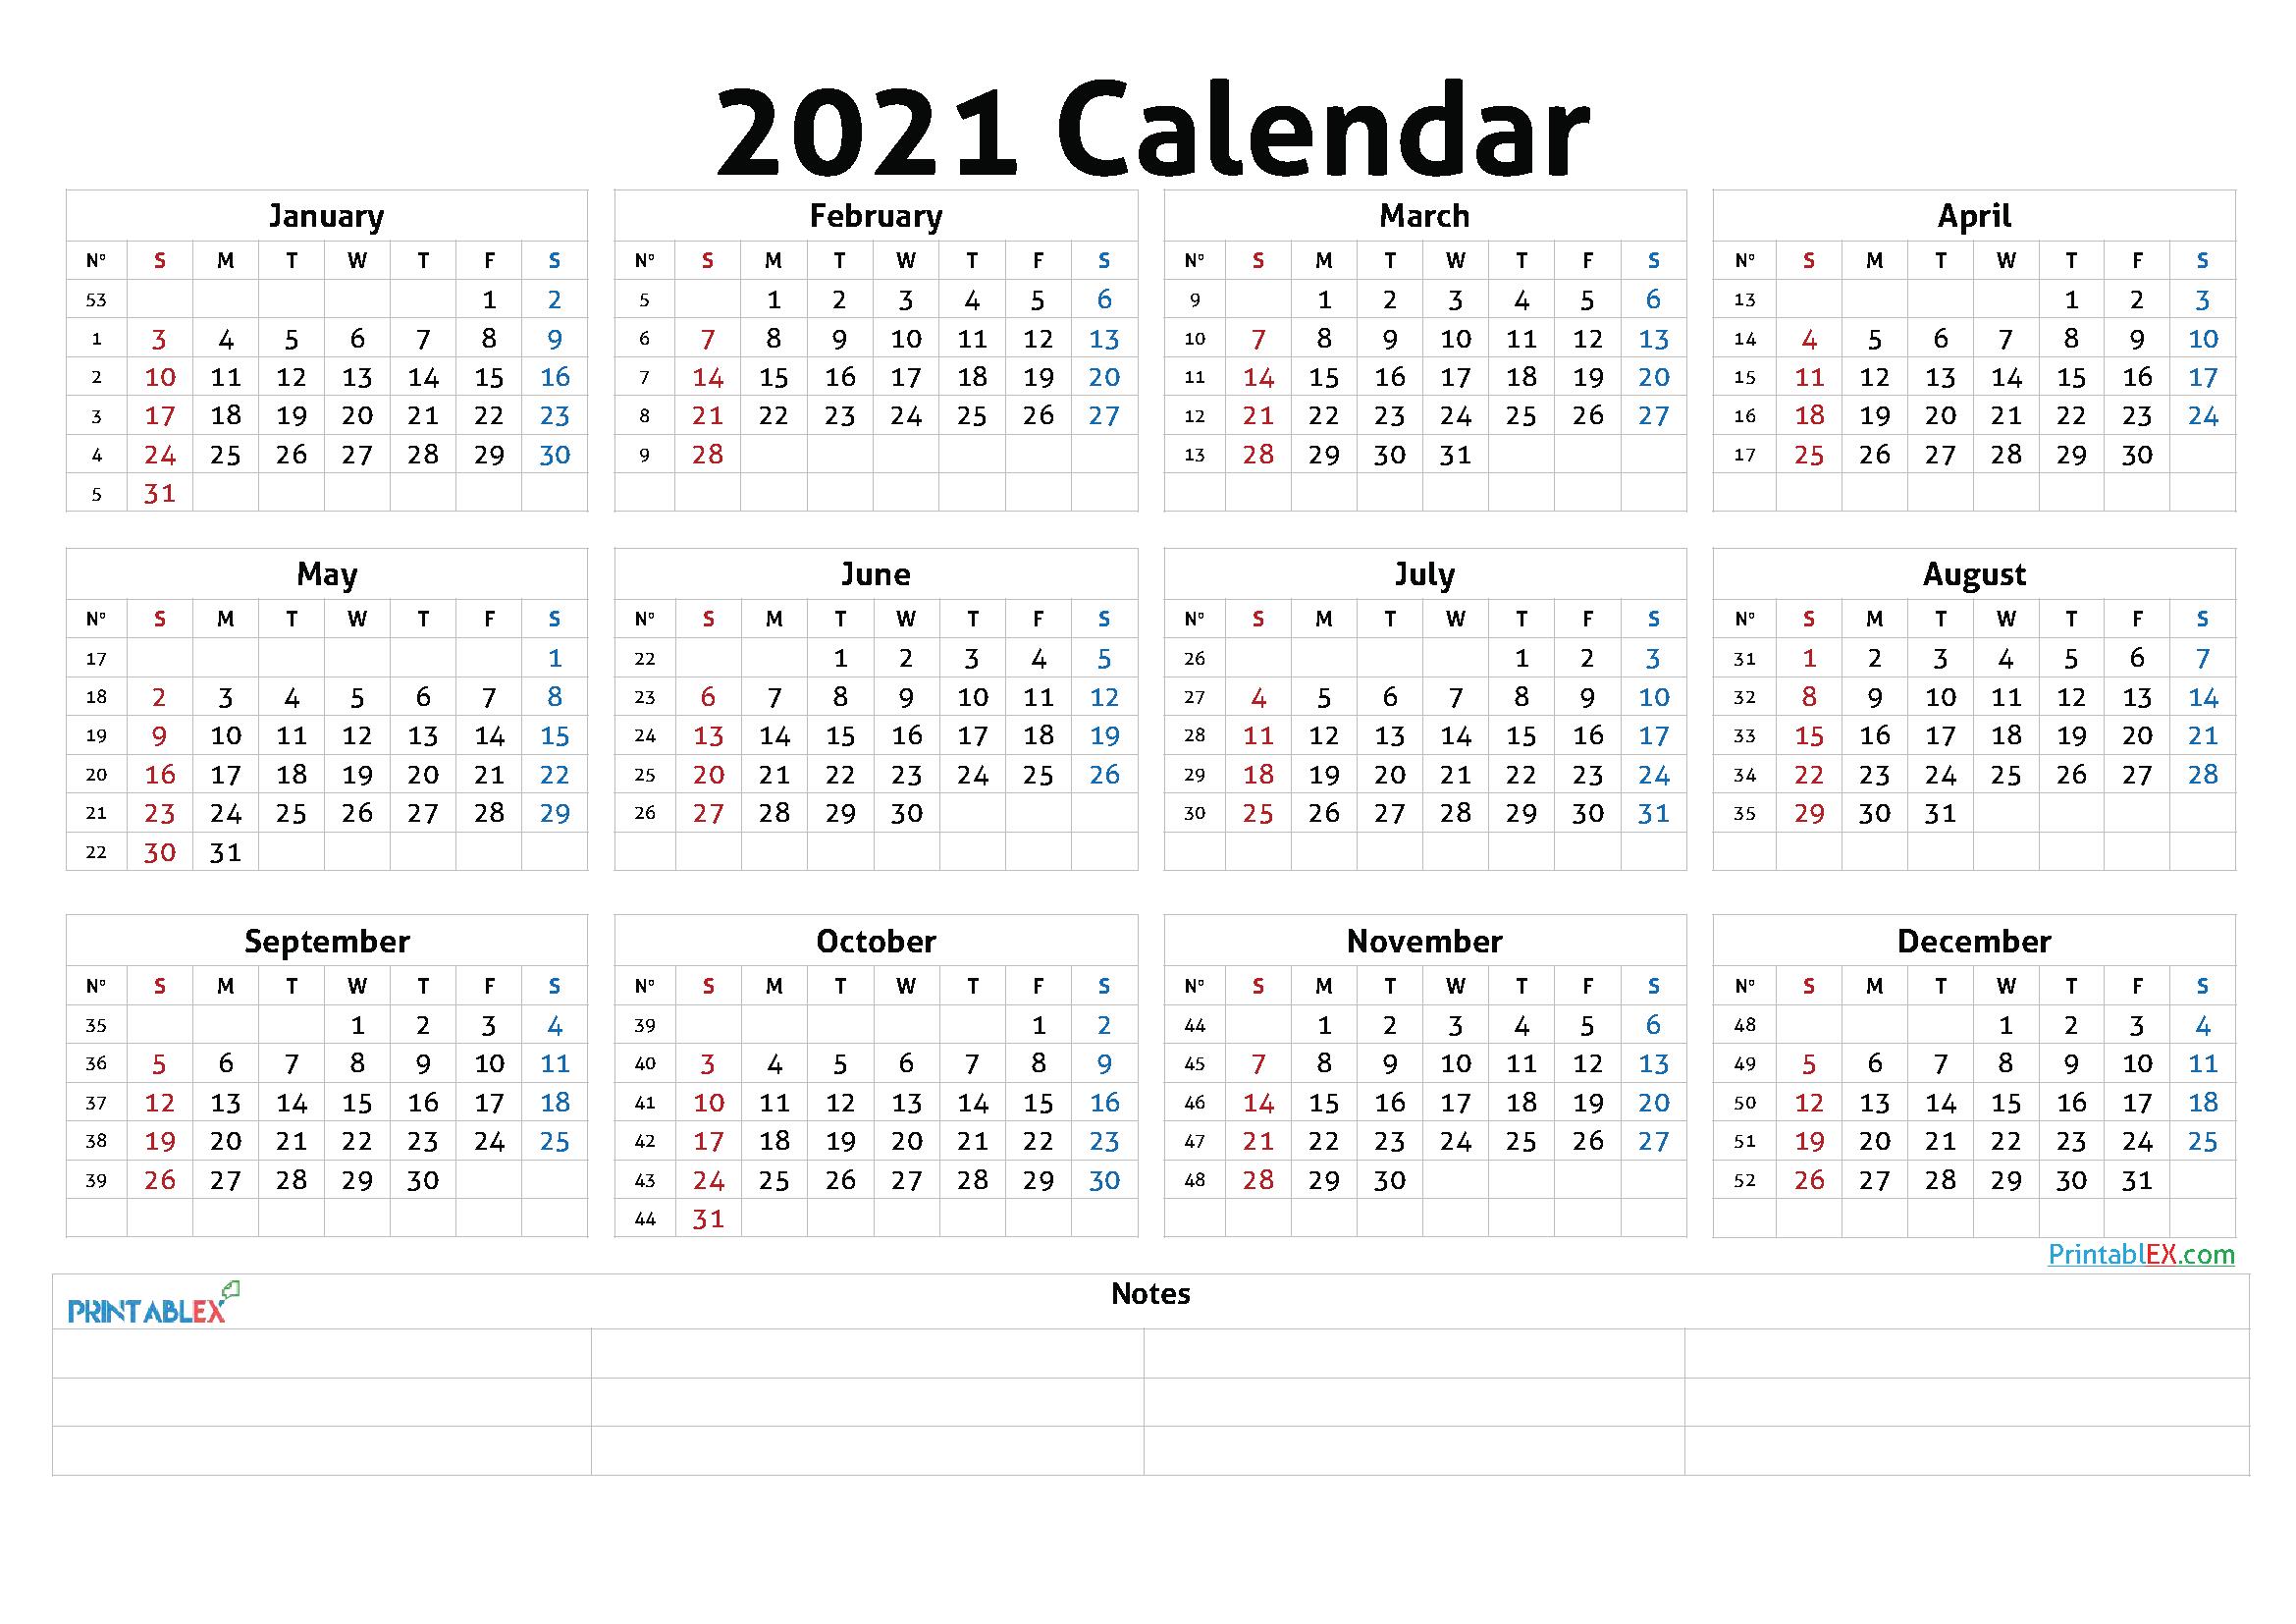 Printable 2021 Calendaryear - 21Ytw46